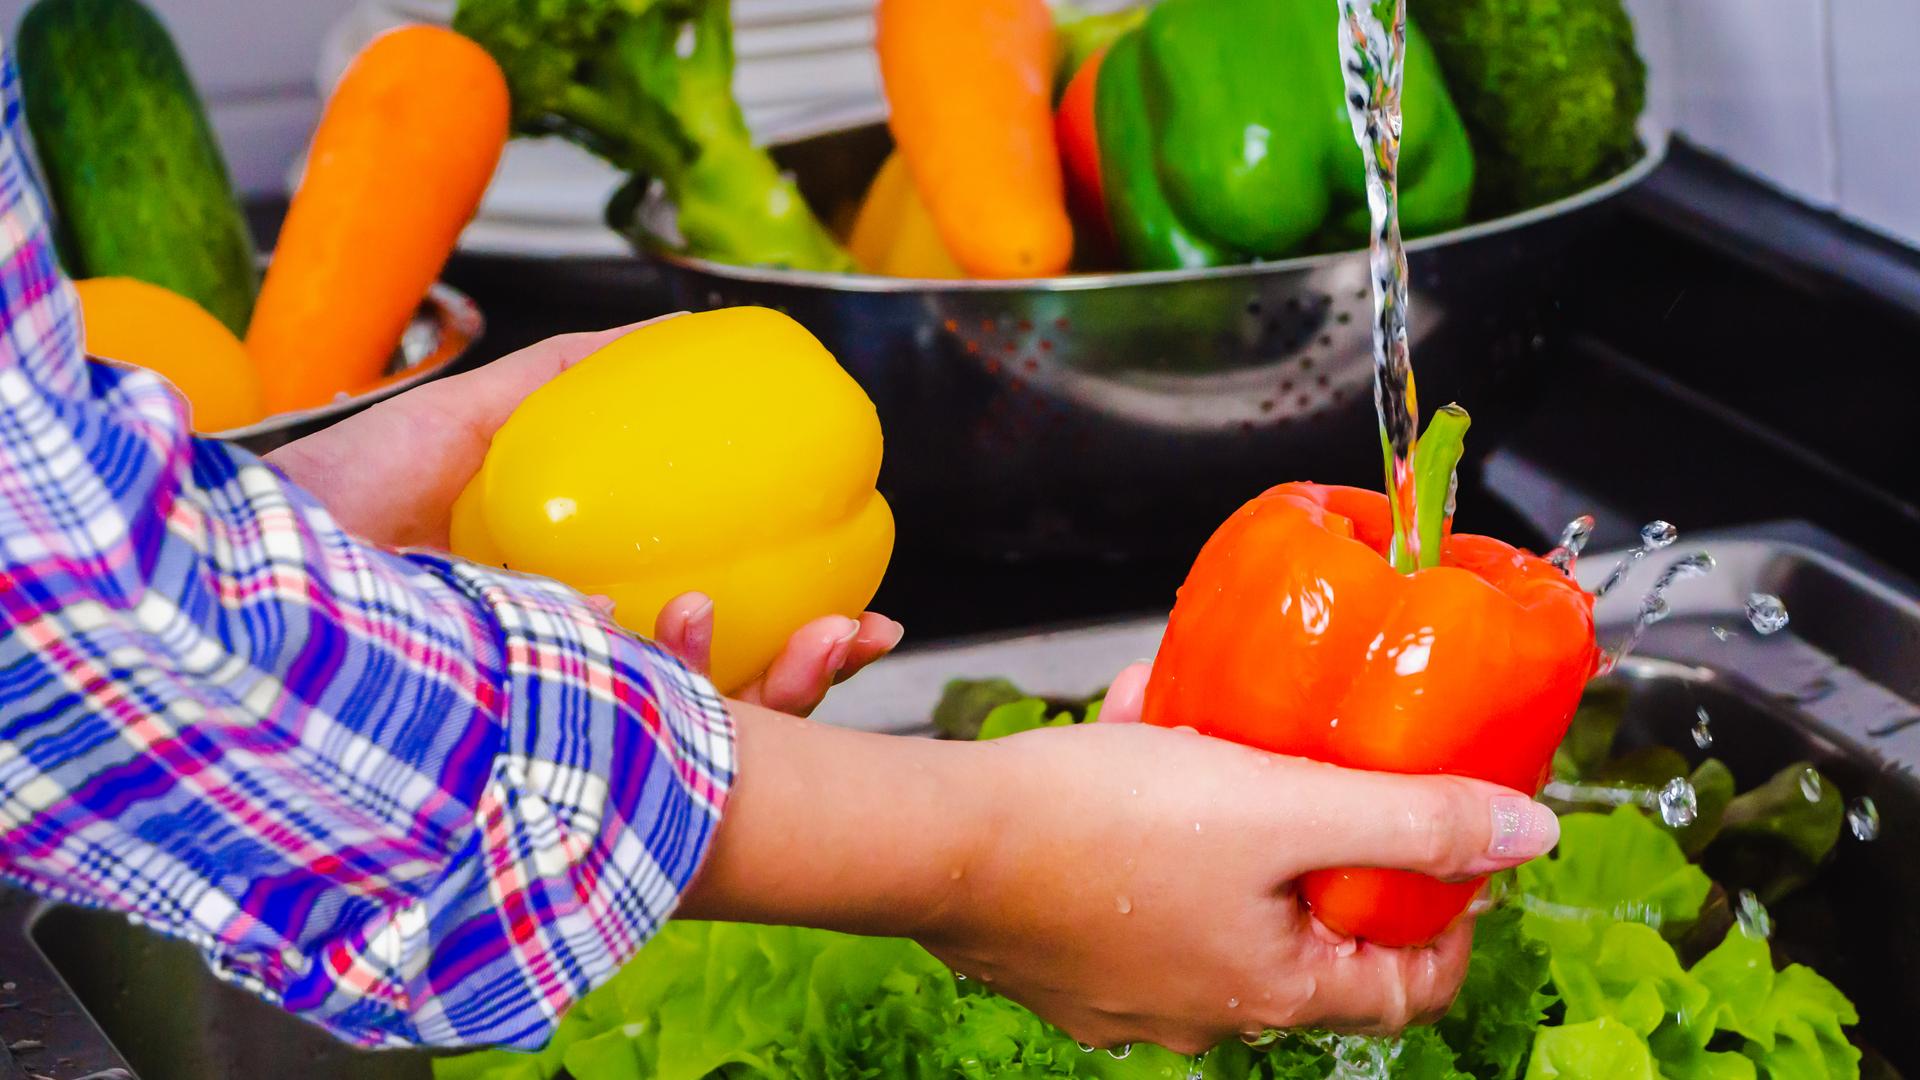 pesticidas en alimentos